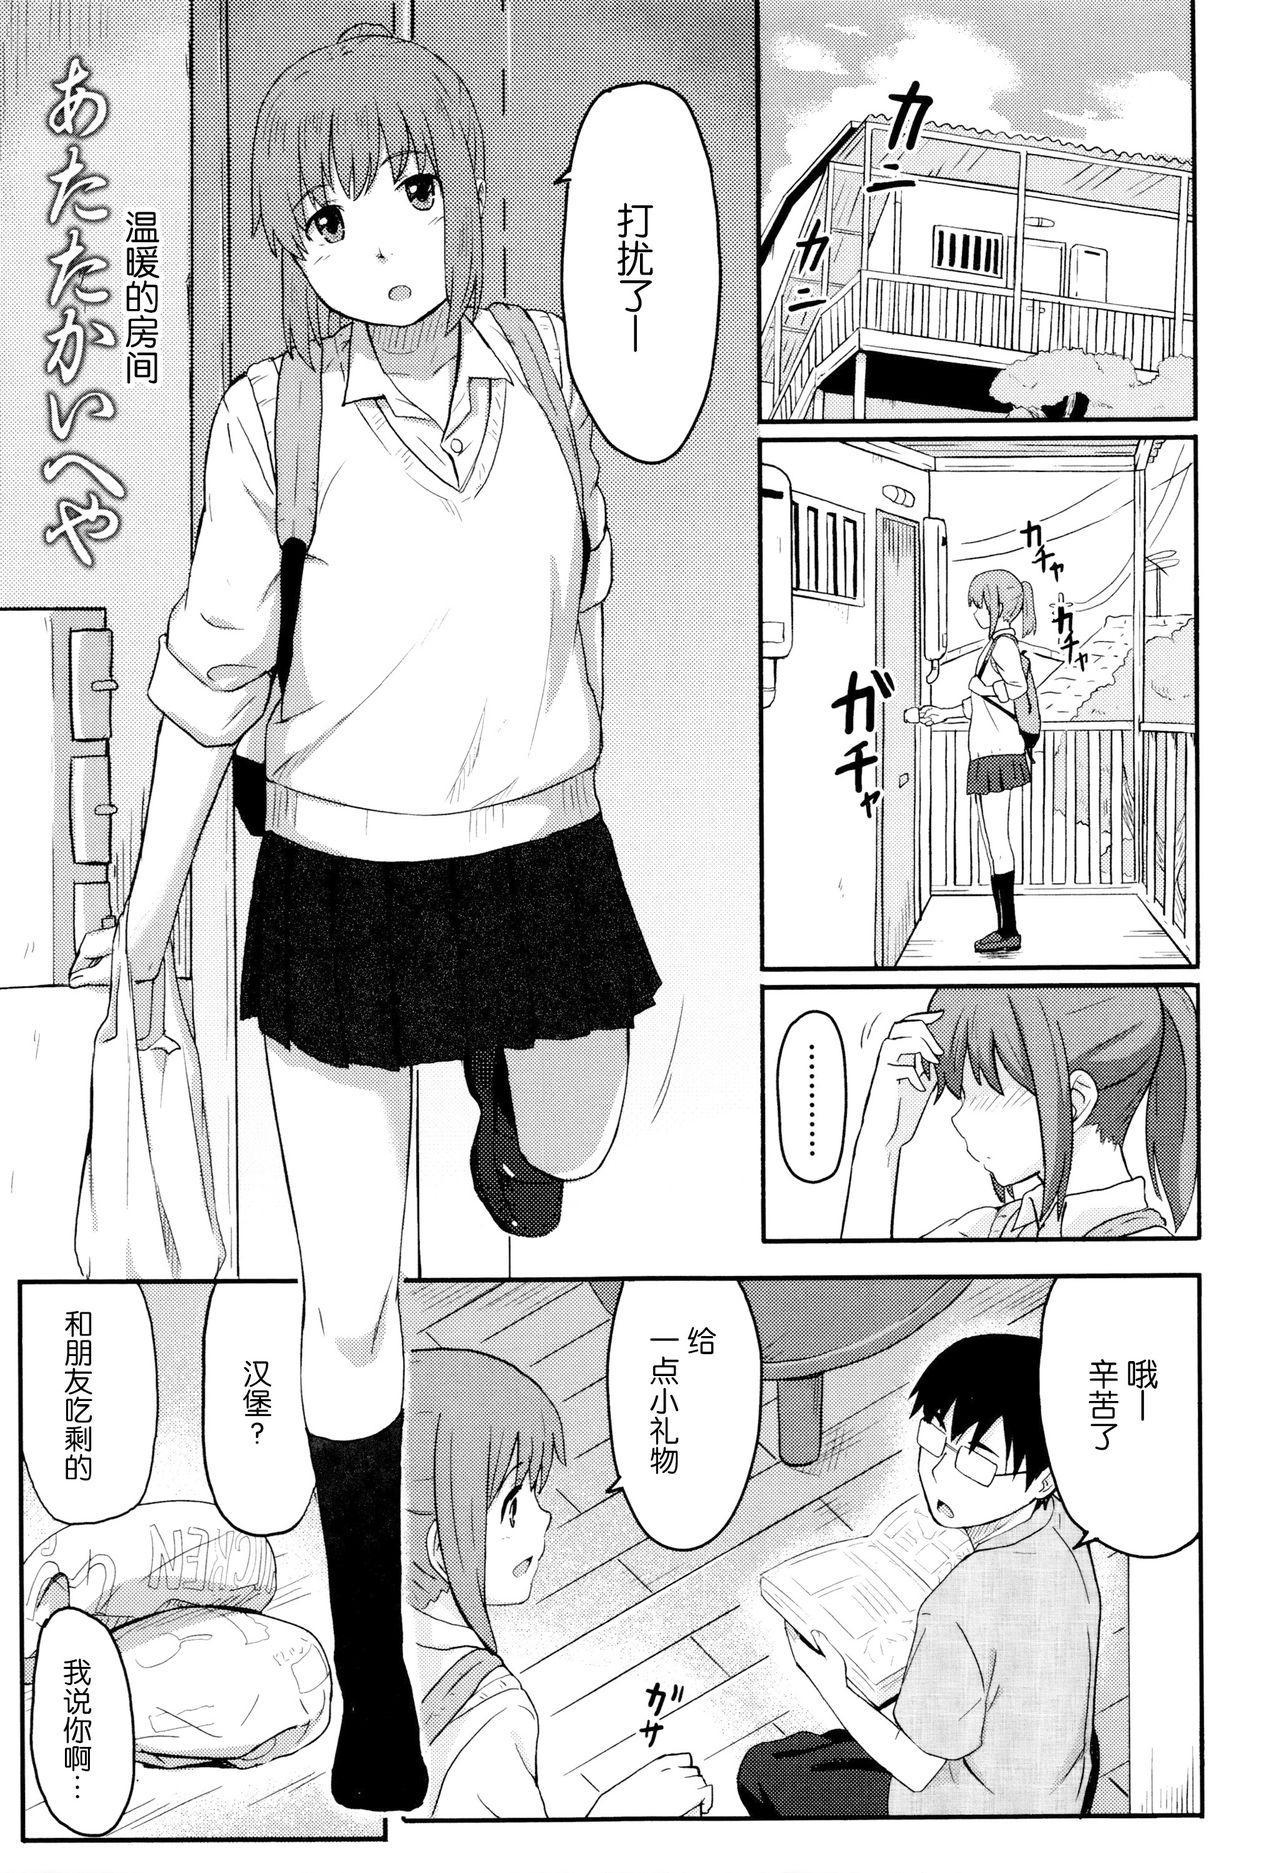 Tokubetsu na Mainichi - Special daily 143